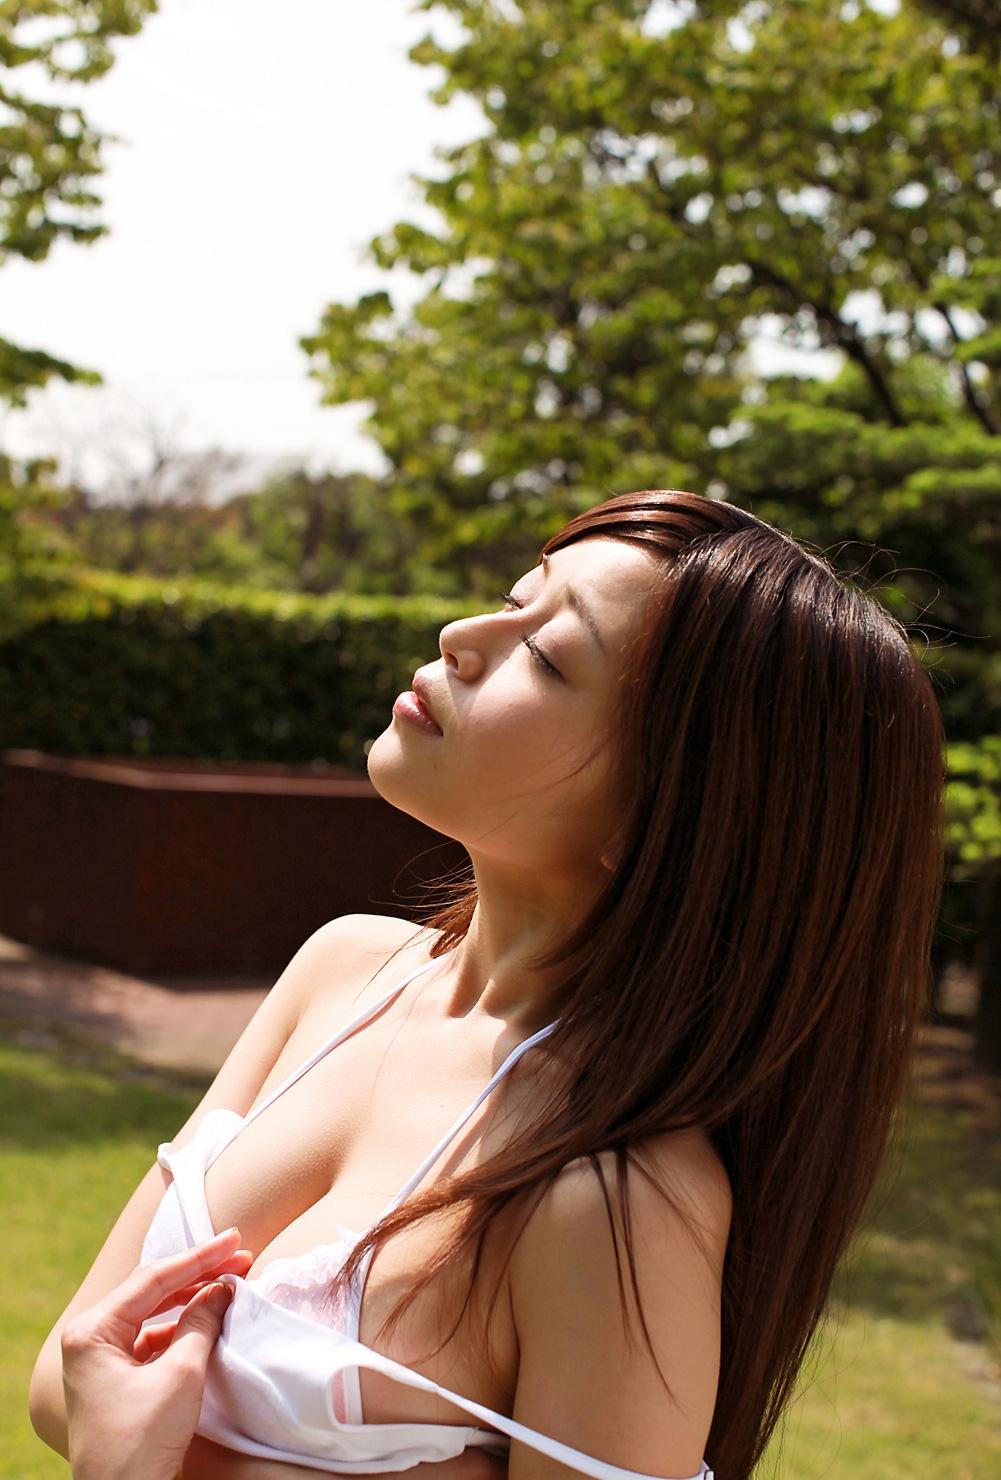 高橋亜由美69